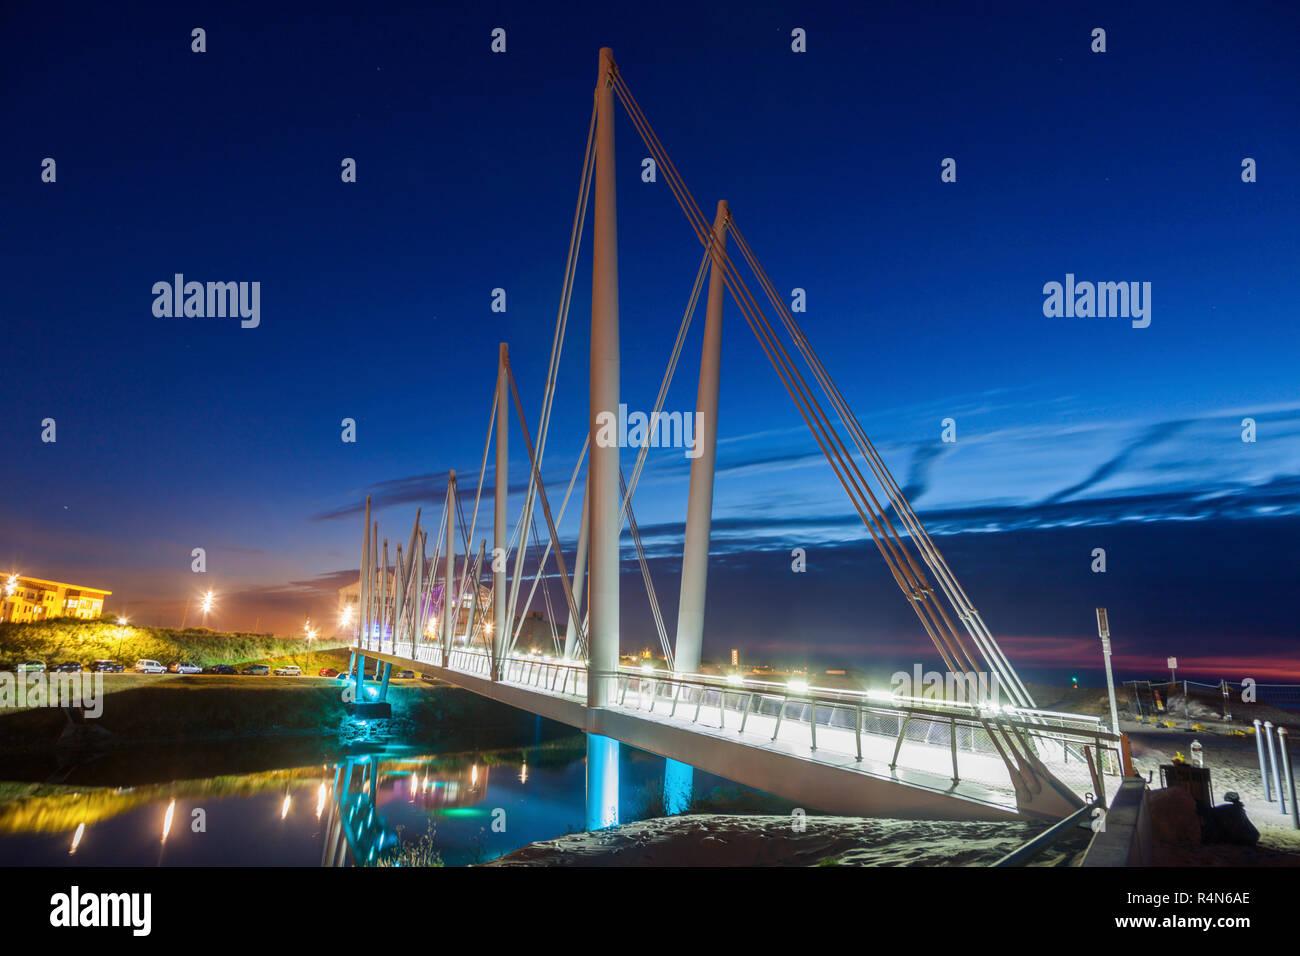 Bridge at night in Dunkirk, France - Stock Image